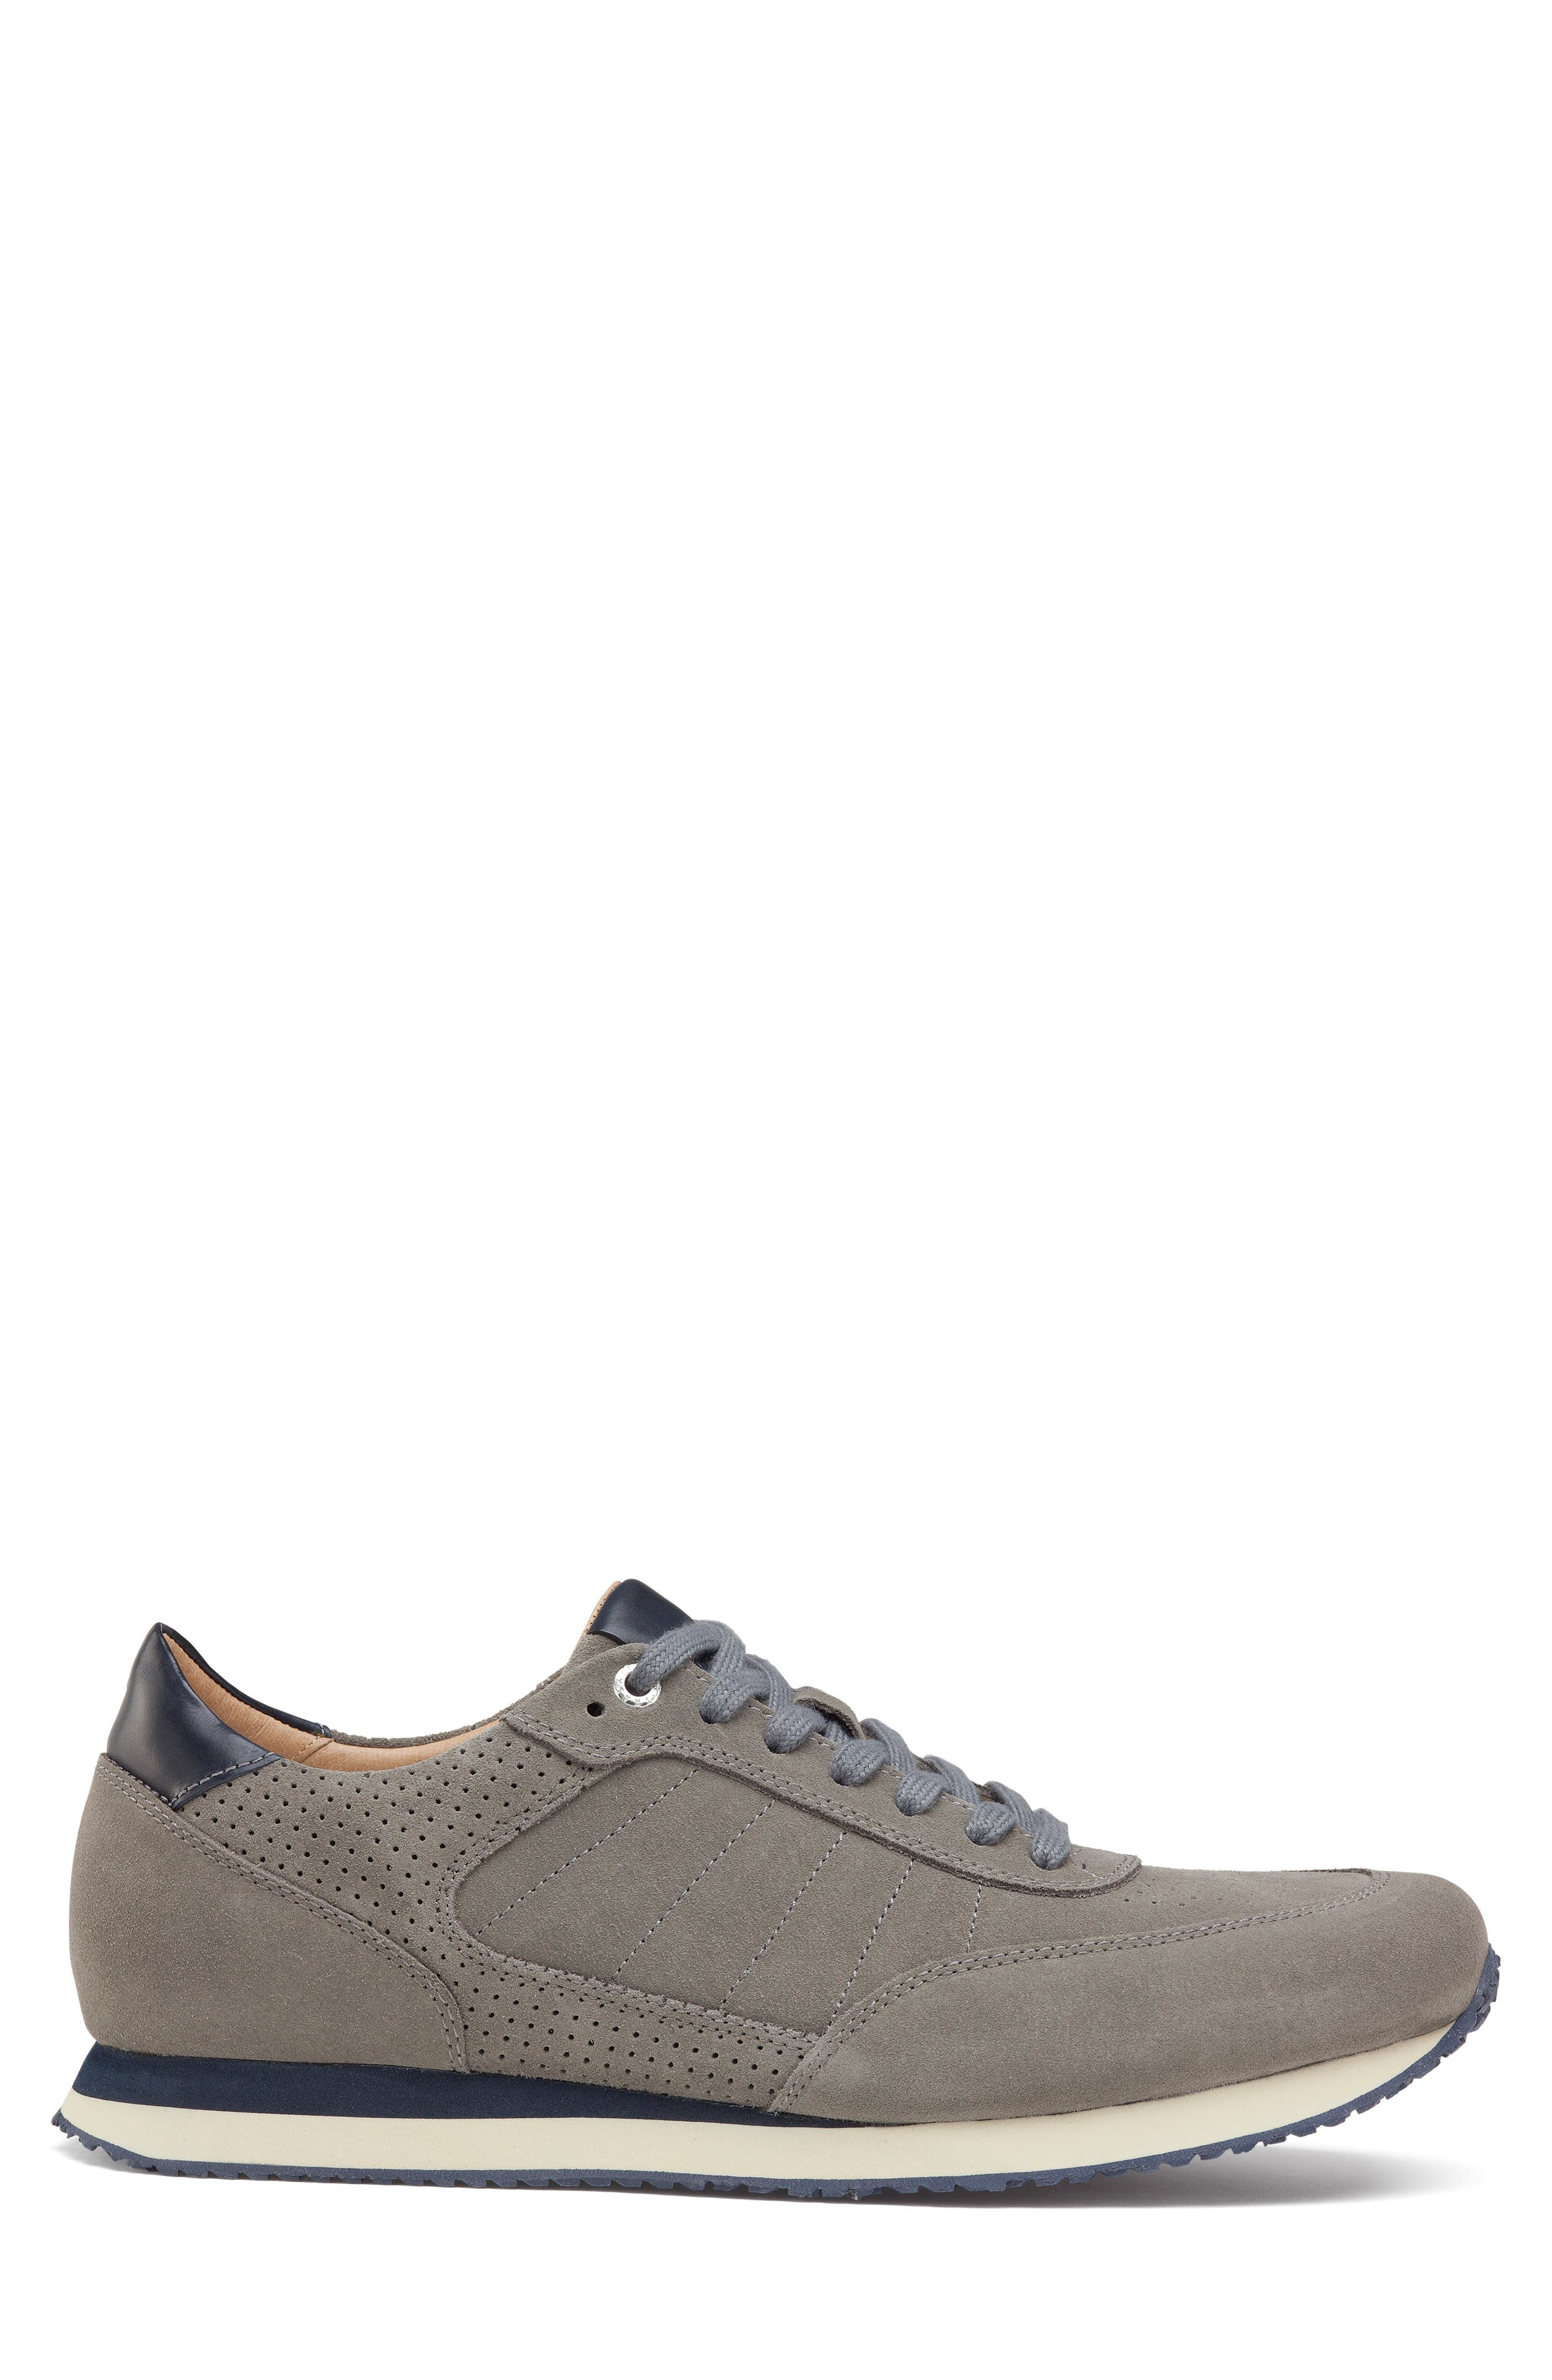 Aiden Sneaker,                             Alternate thumbnail 3, color,                             GREY SUEDE